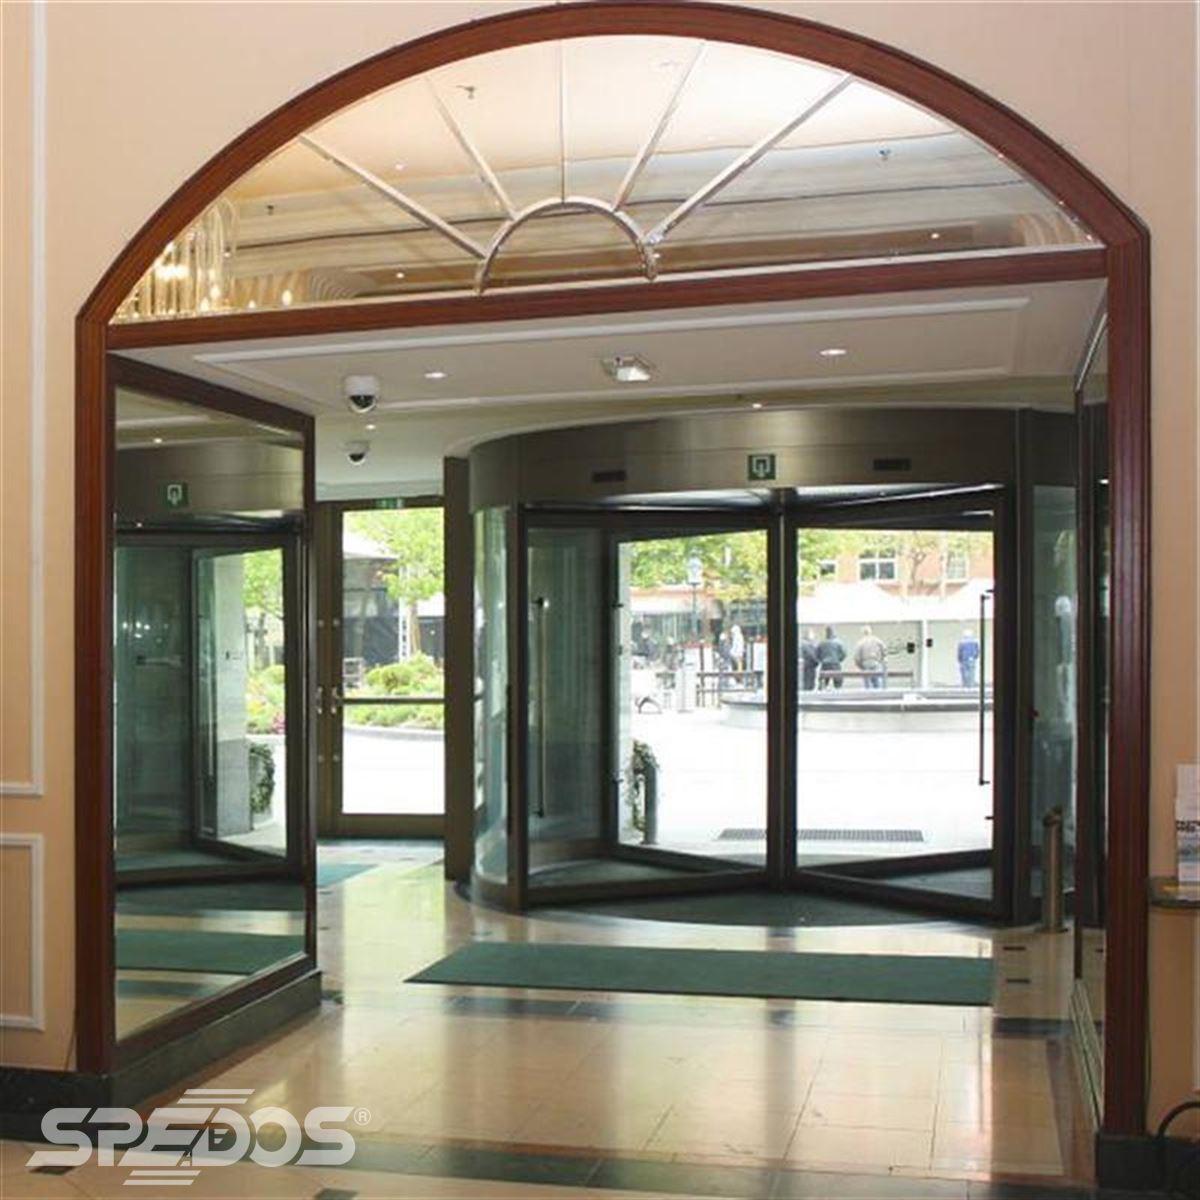 karuselové dveře Tourniket pro hotel Carlton Bratislava 4